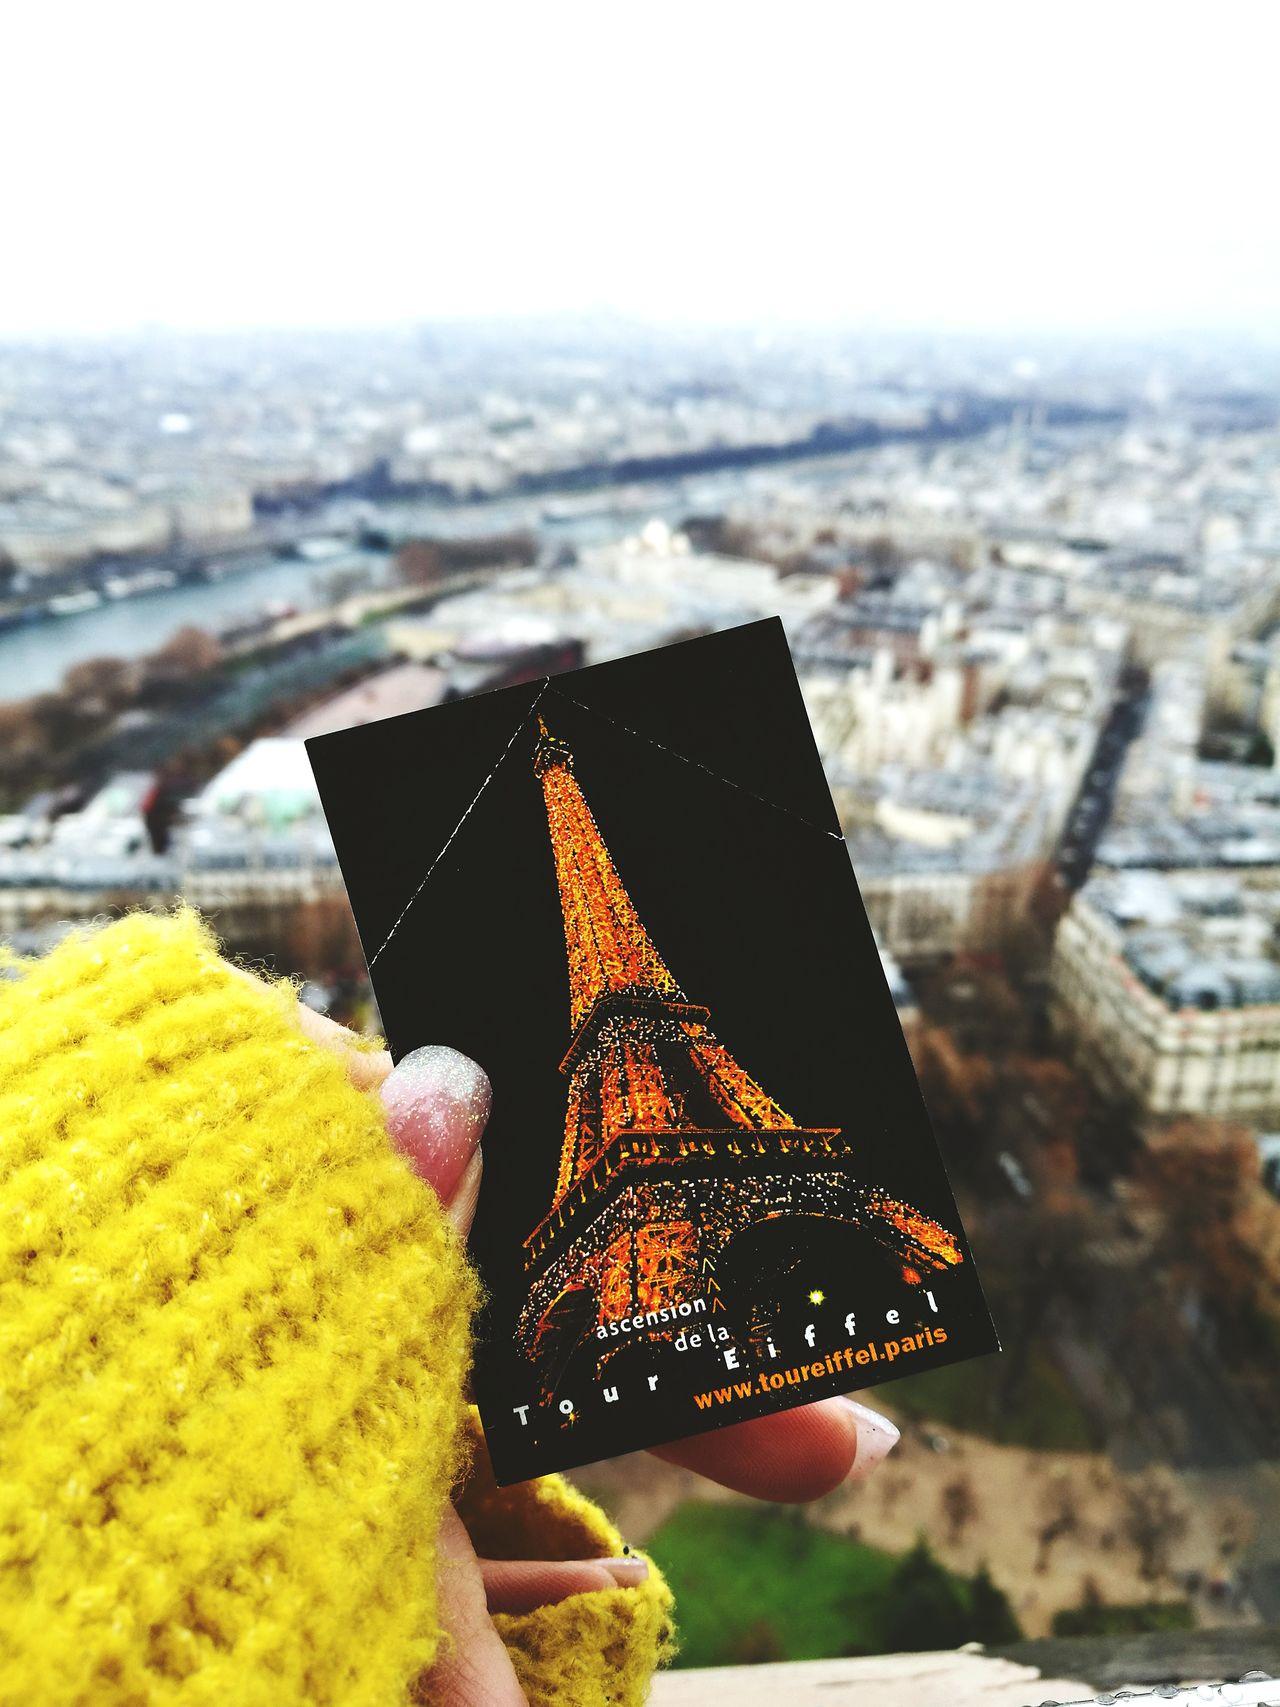 Close-up Day Sky Love Paris ❤ Tour Eiffel, Paris. Cloud - Sky Fog Architecture Scenics EyeEm Best Shots EyeEmNewHere History Cultures Light Effect Tranquil Scene Freshness